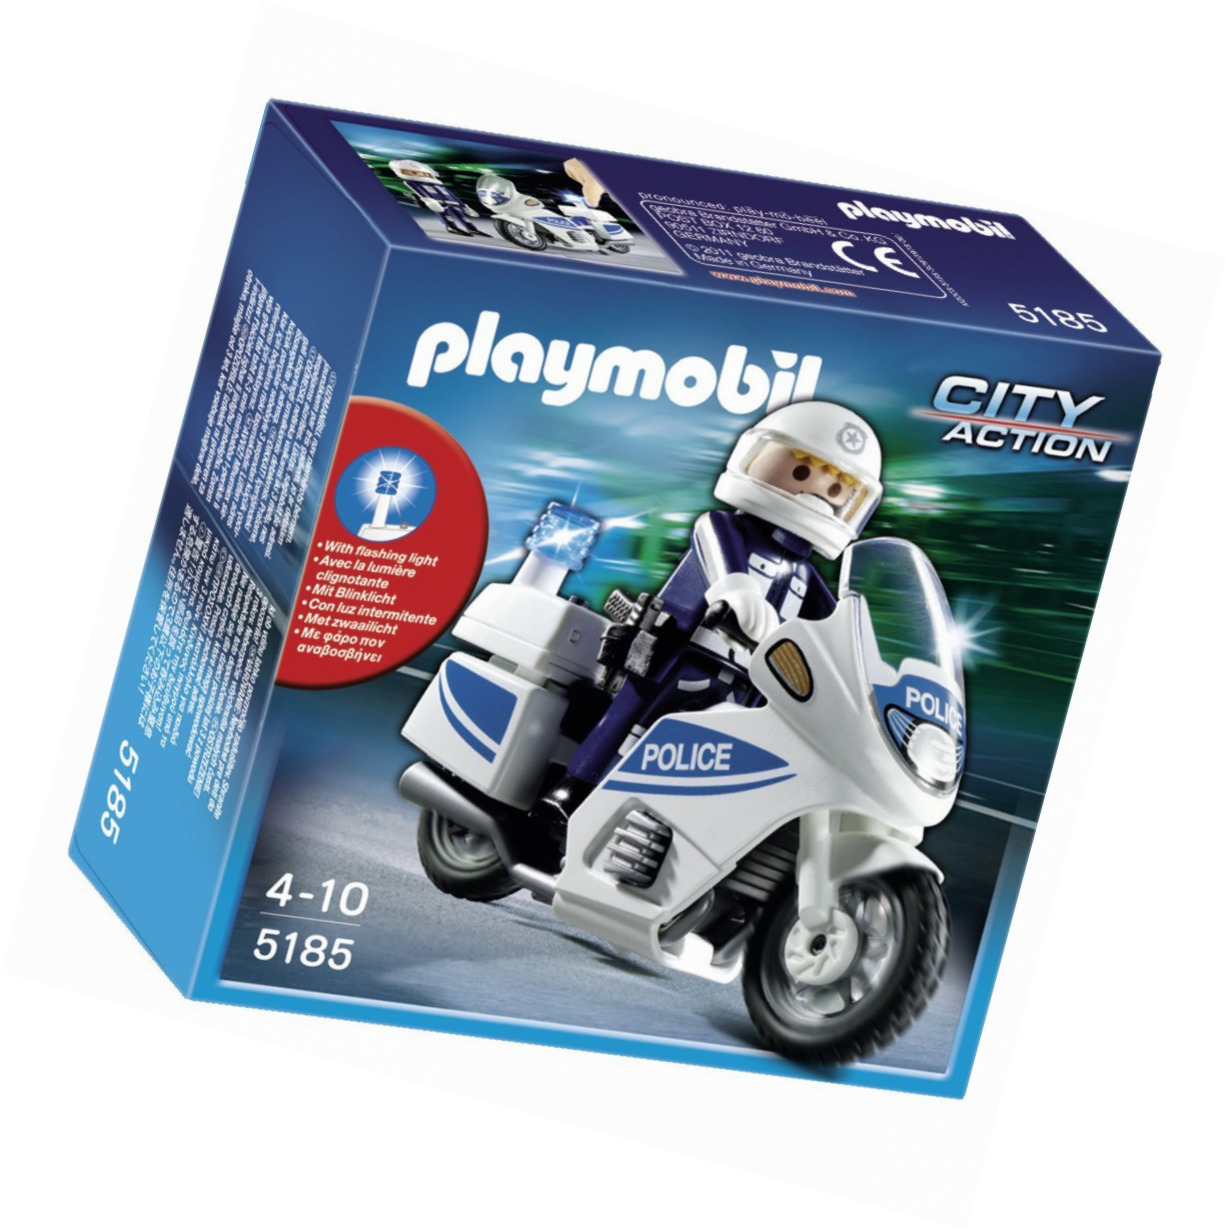 Playmobil city action motorbike